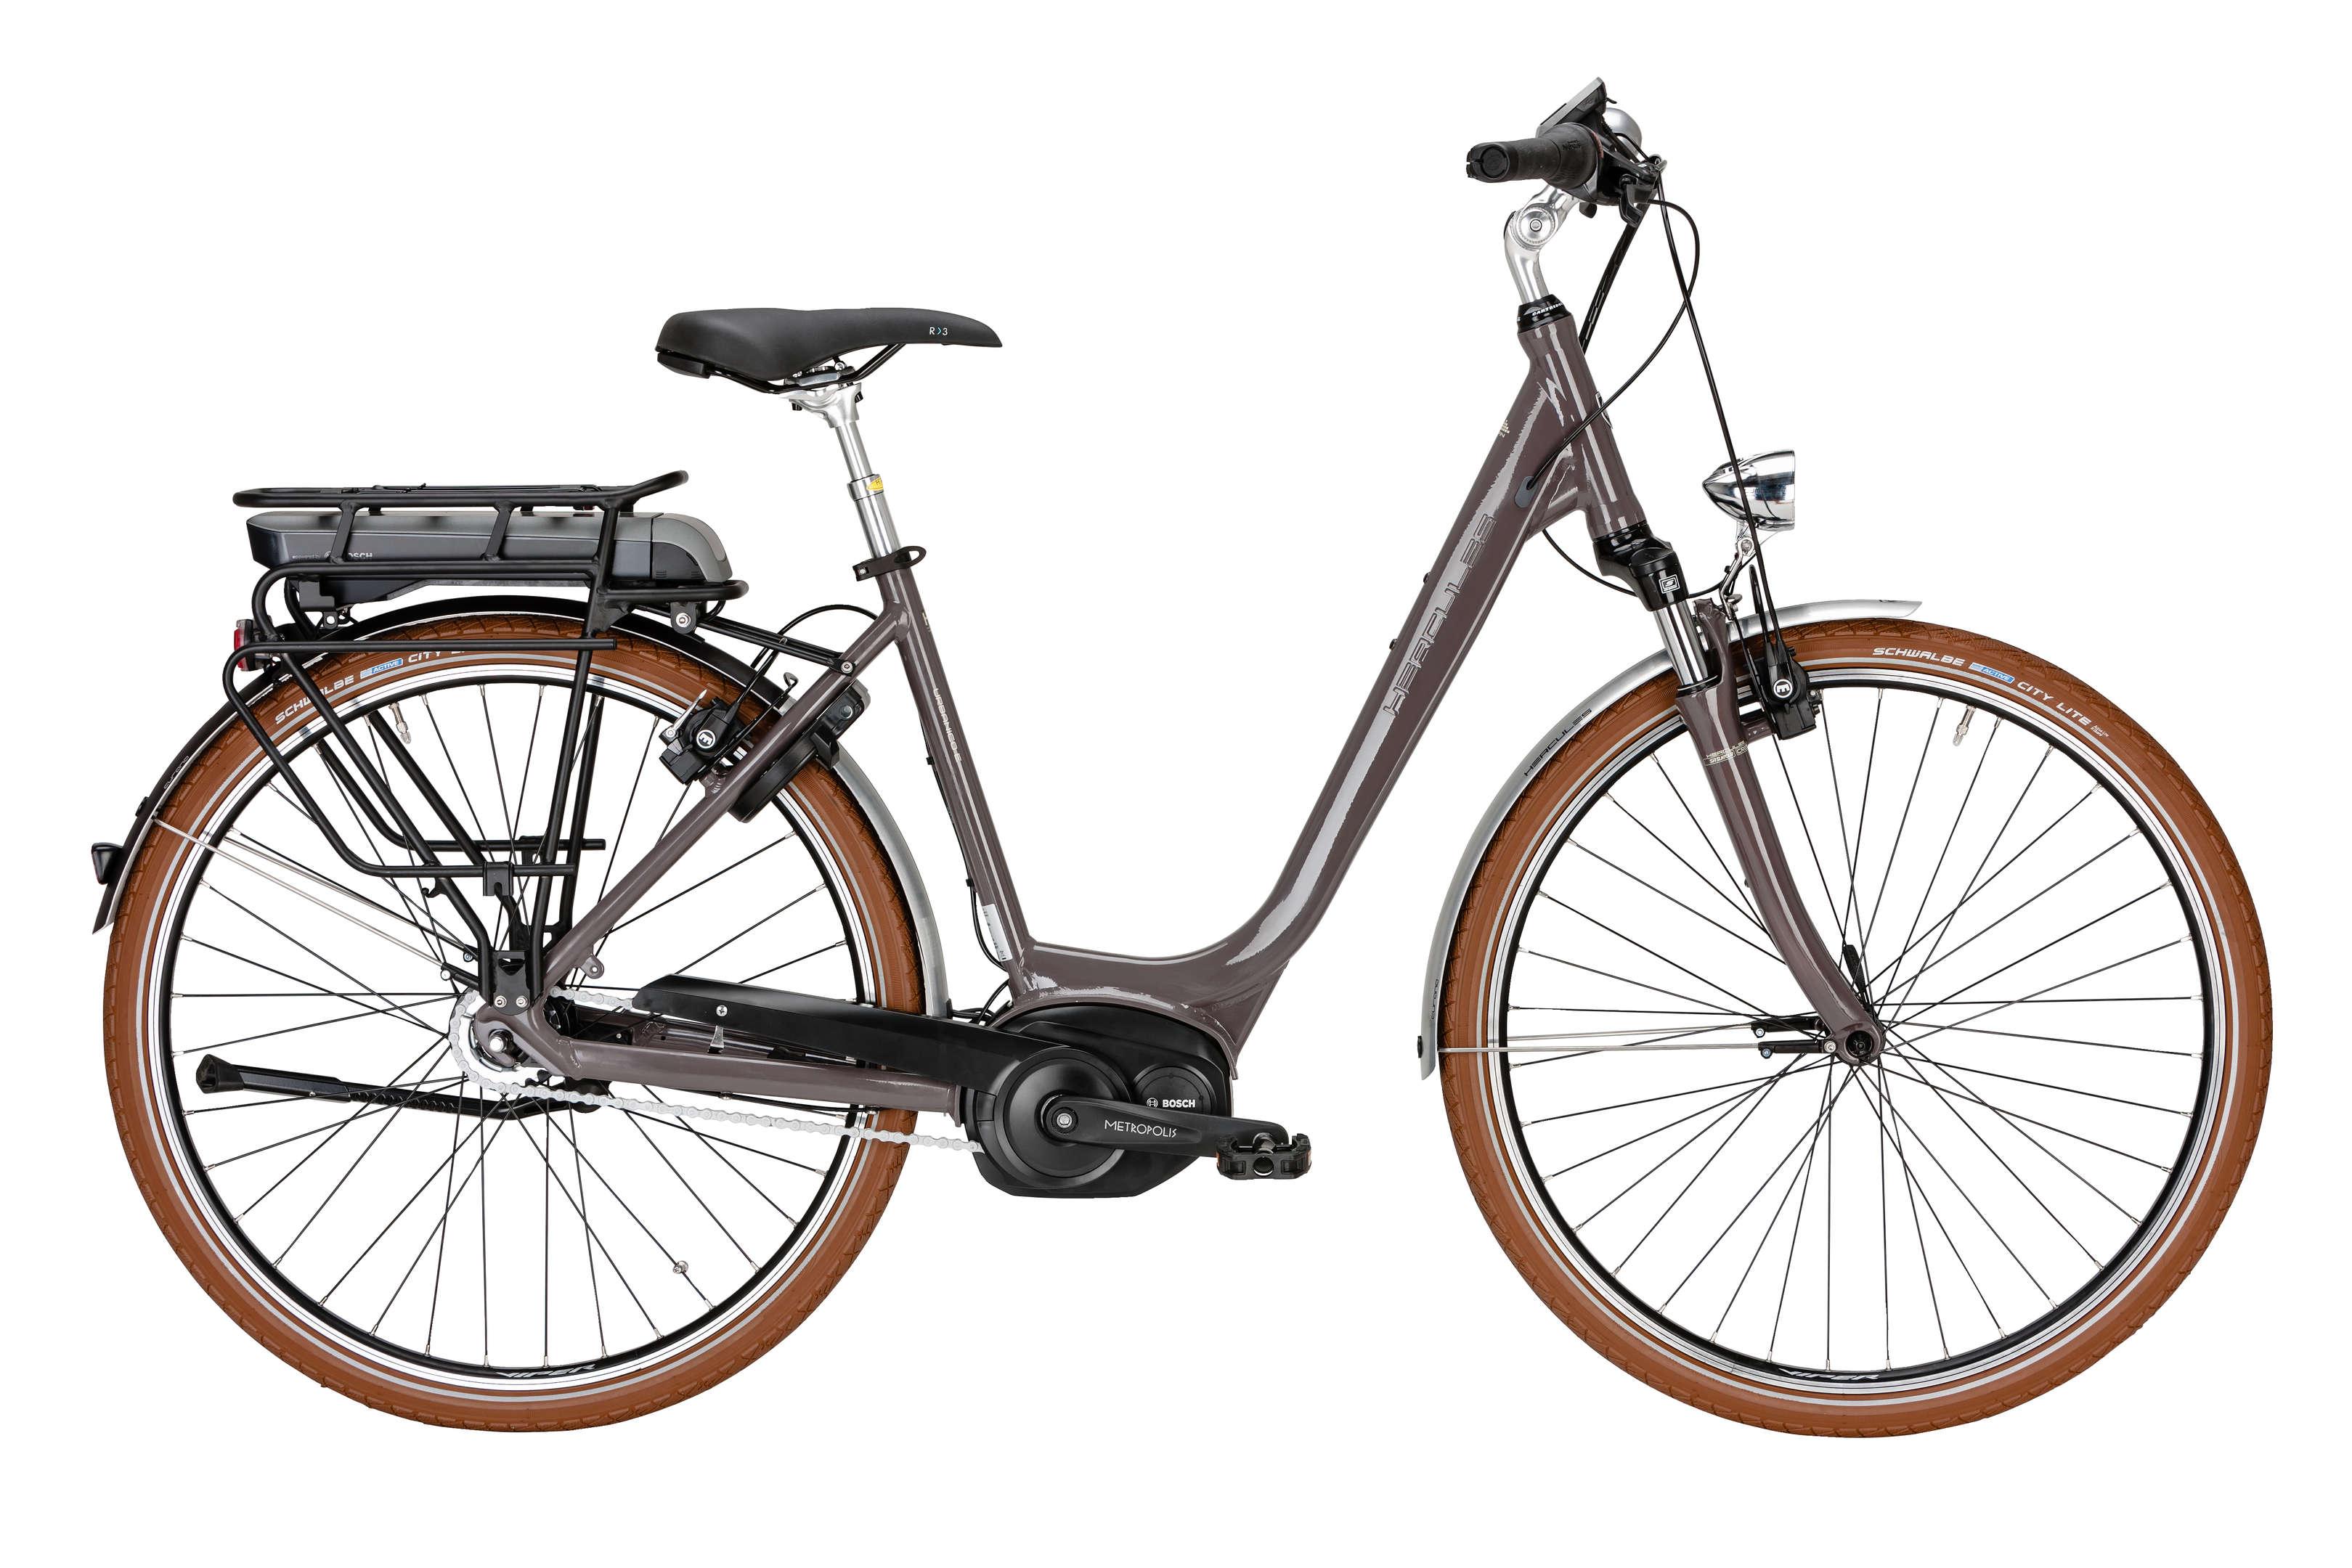 hercules e bike urbanico e f8 eurorad bikeleasingeurorad. Black Bedroom Furniture Sets. Home Design Ideas